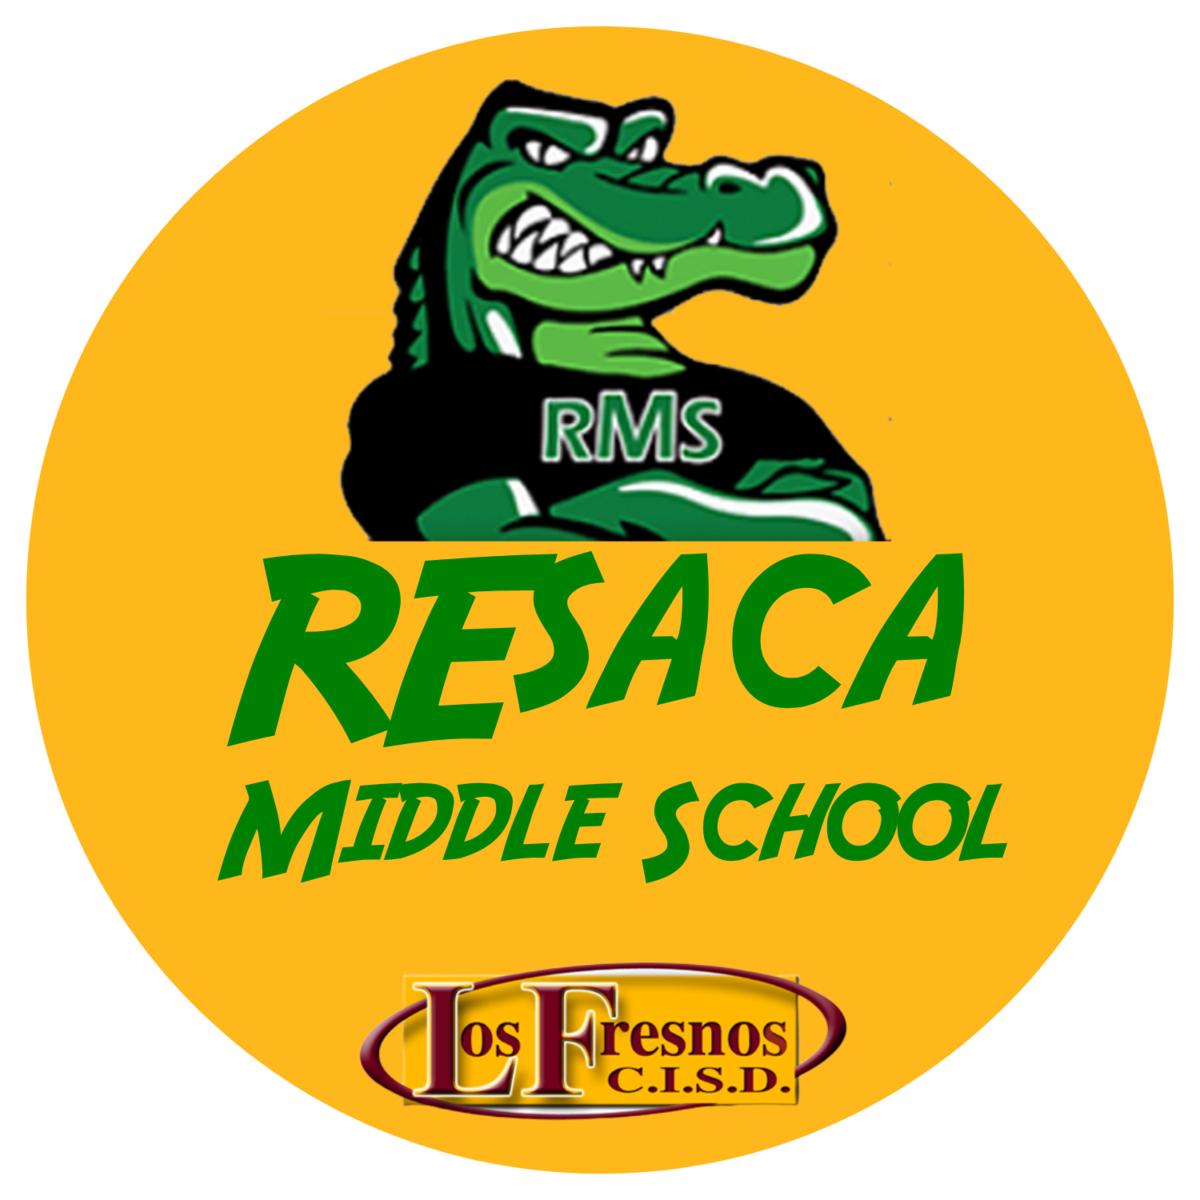 Resaca Middle School logo